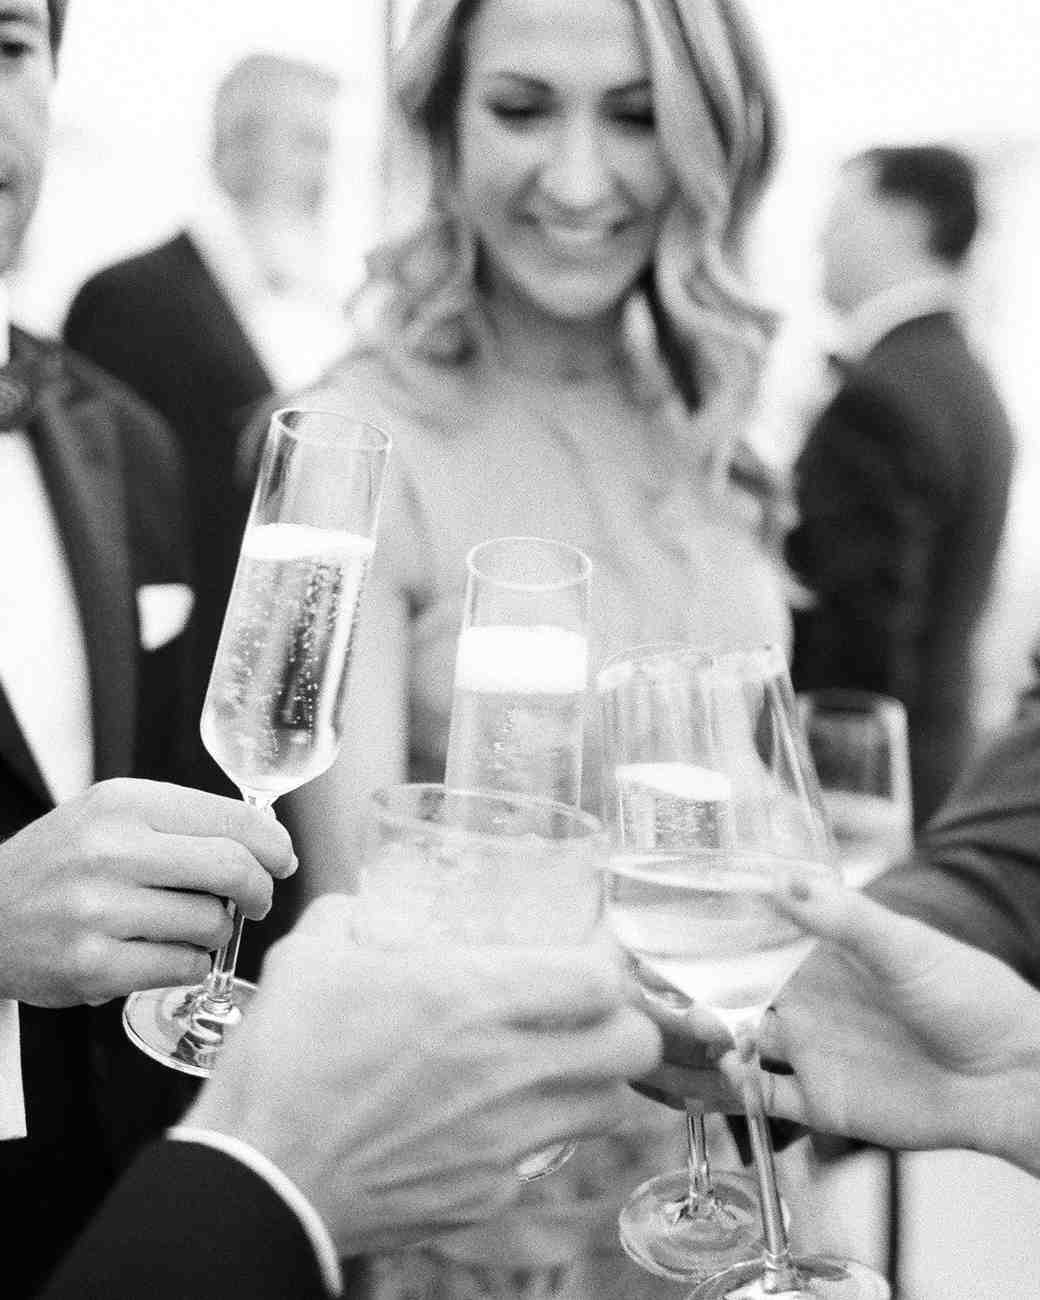 sloan scott wedding guests cheers champagne